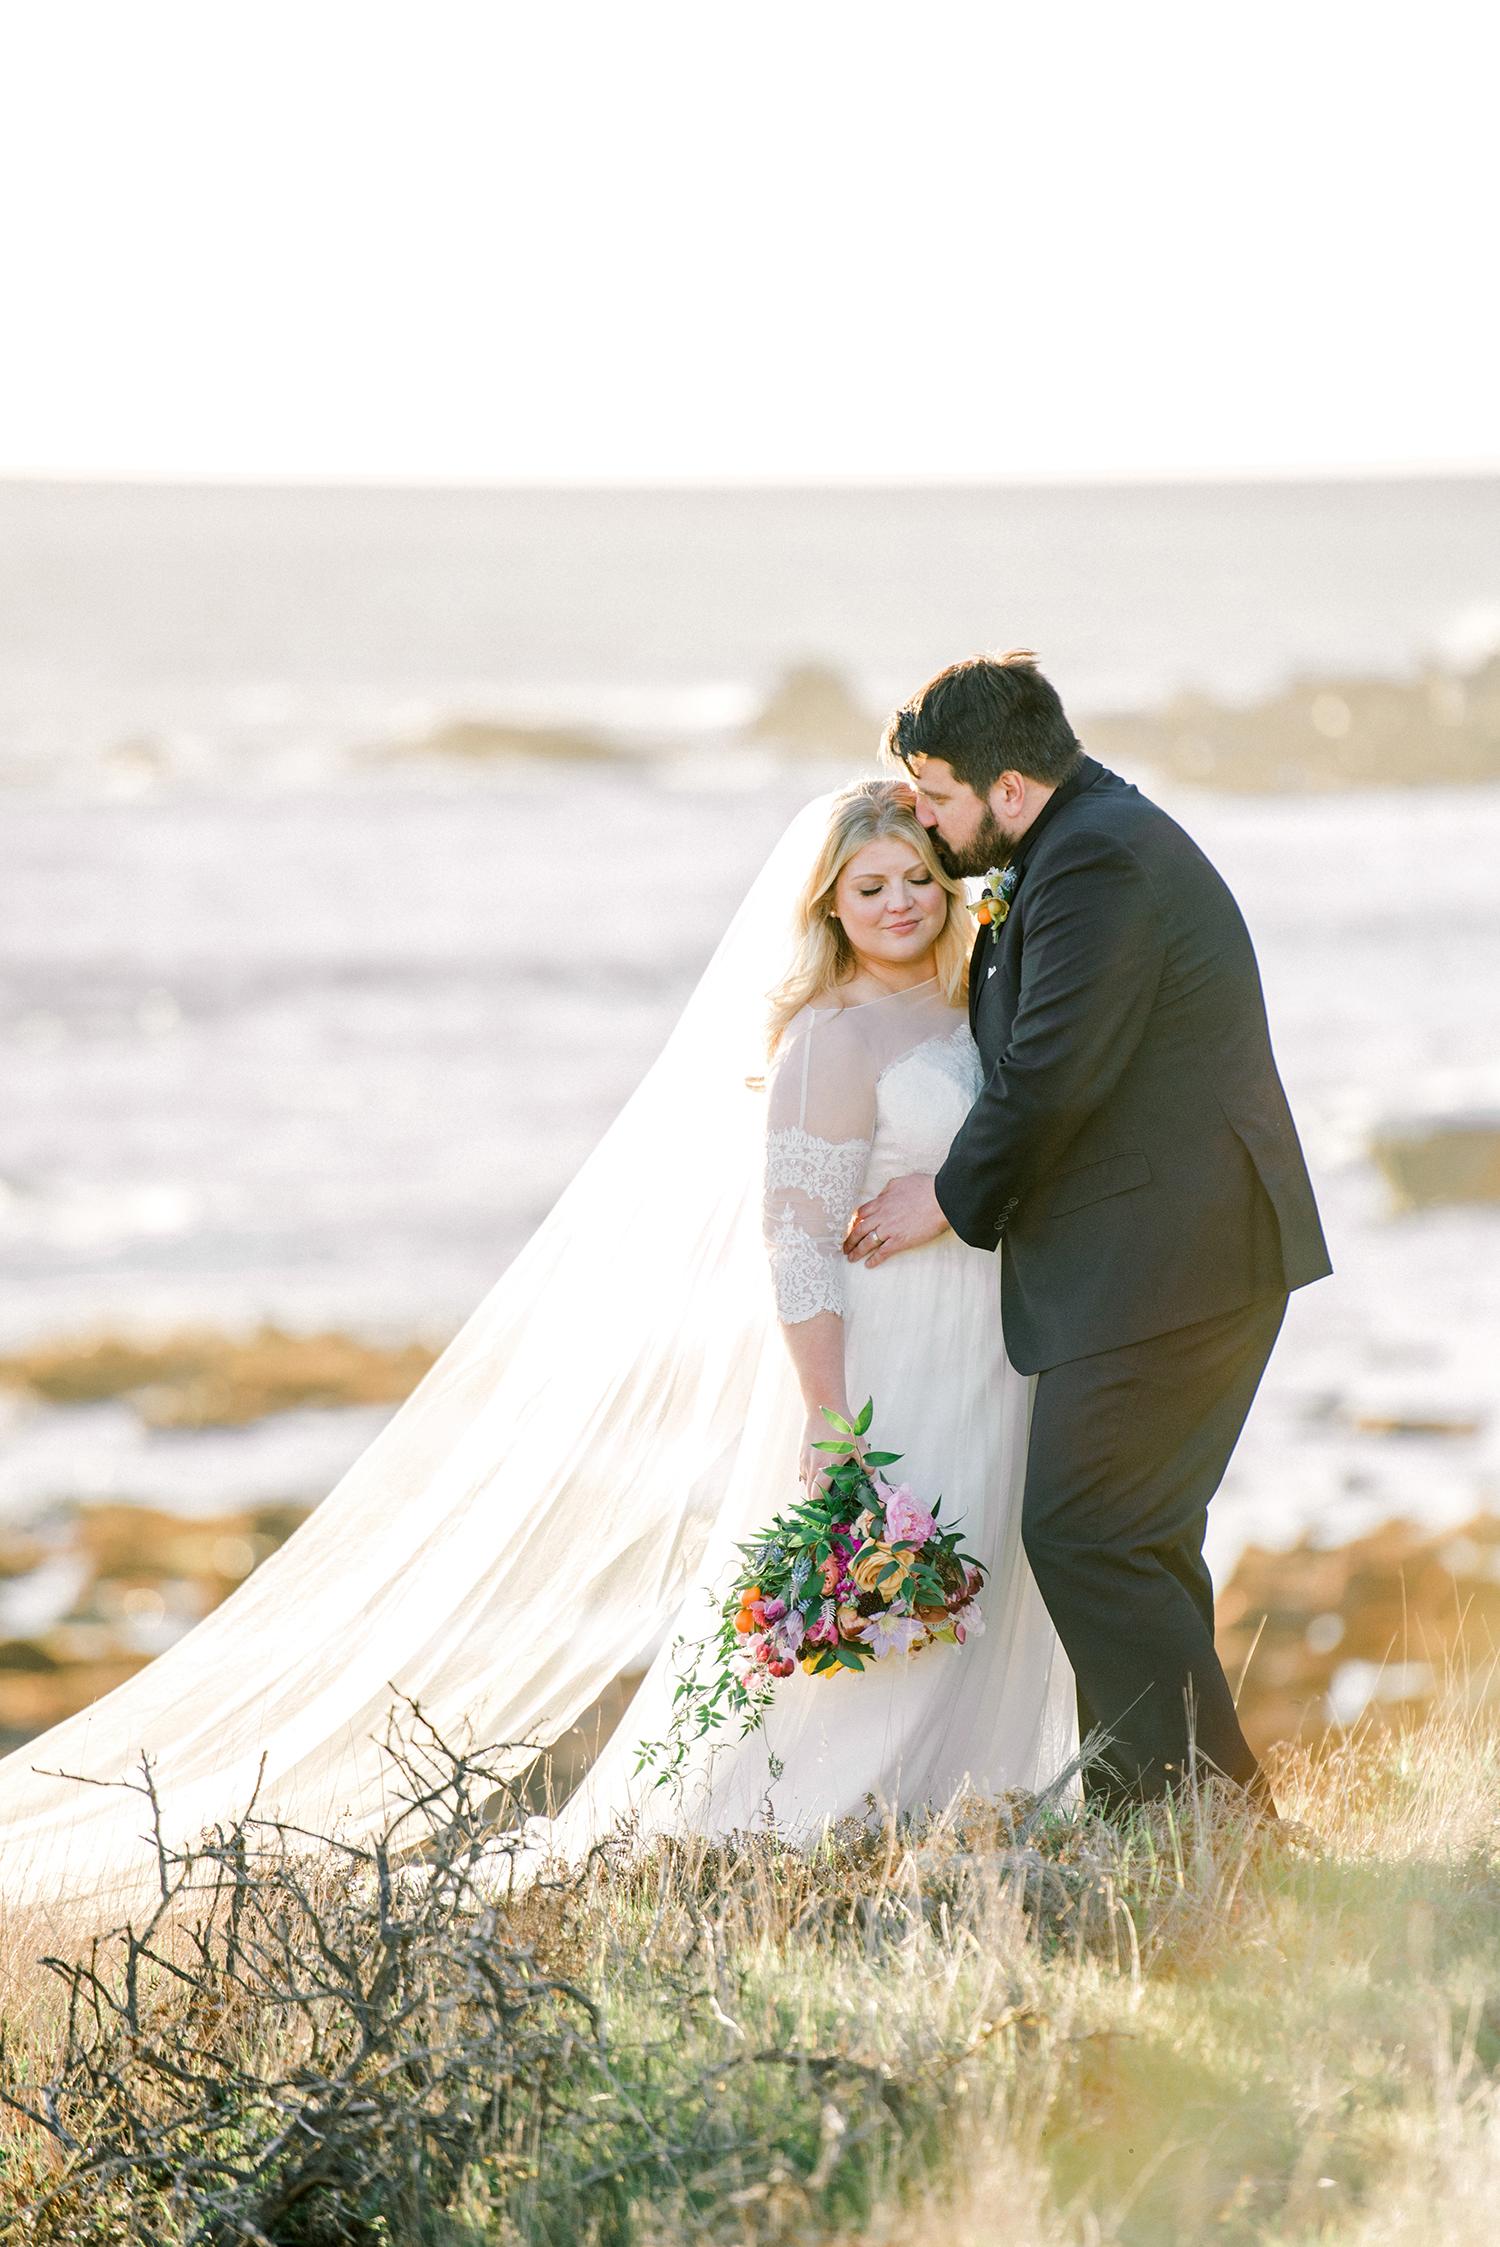 johanna erik wedding couple in grass by water